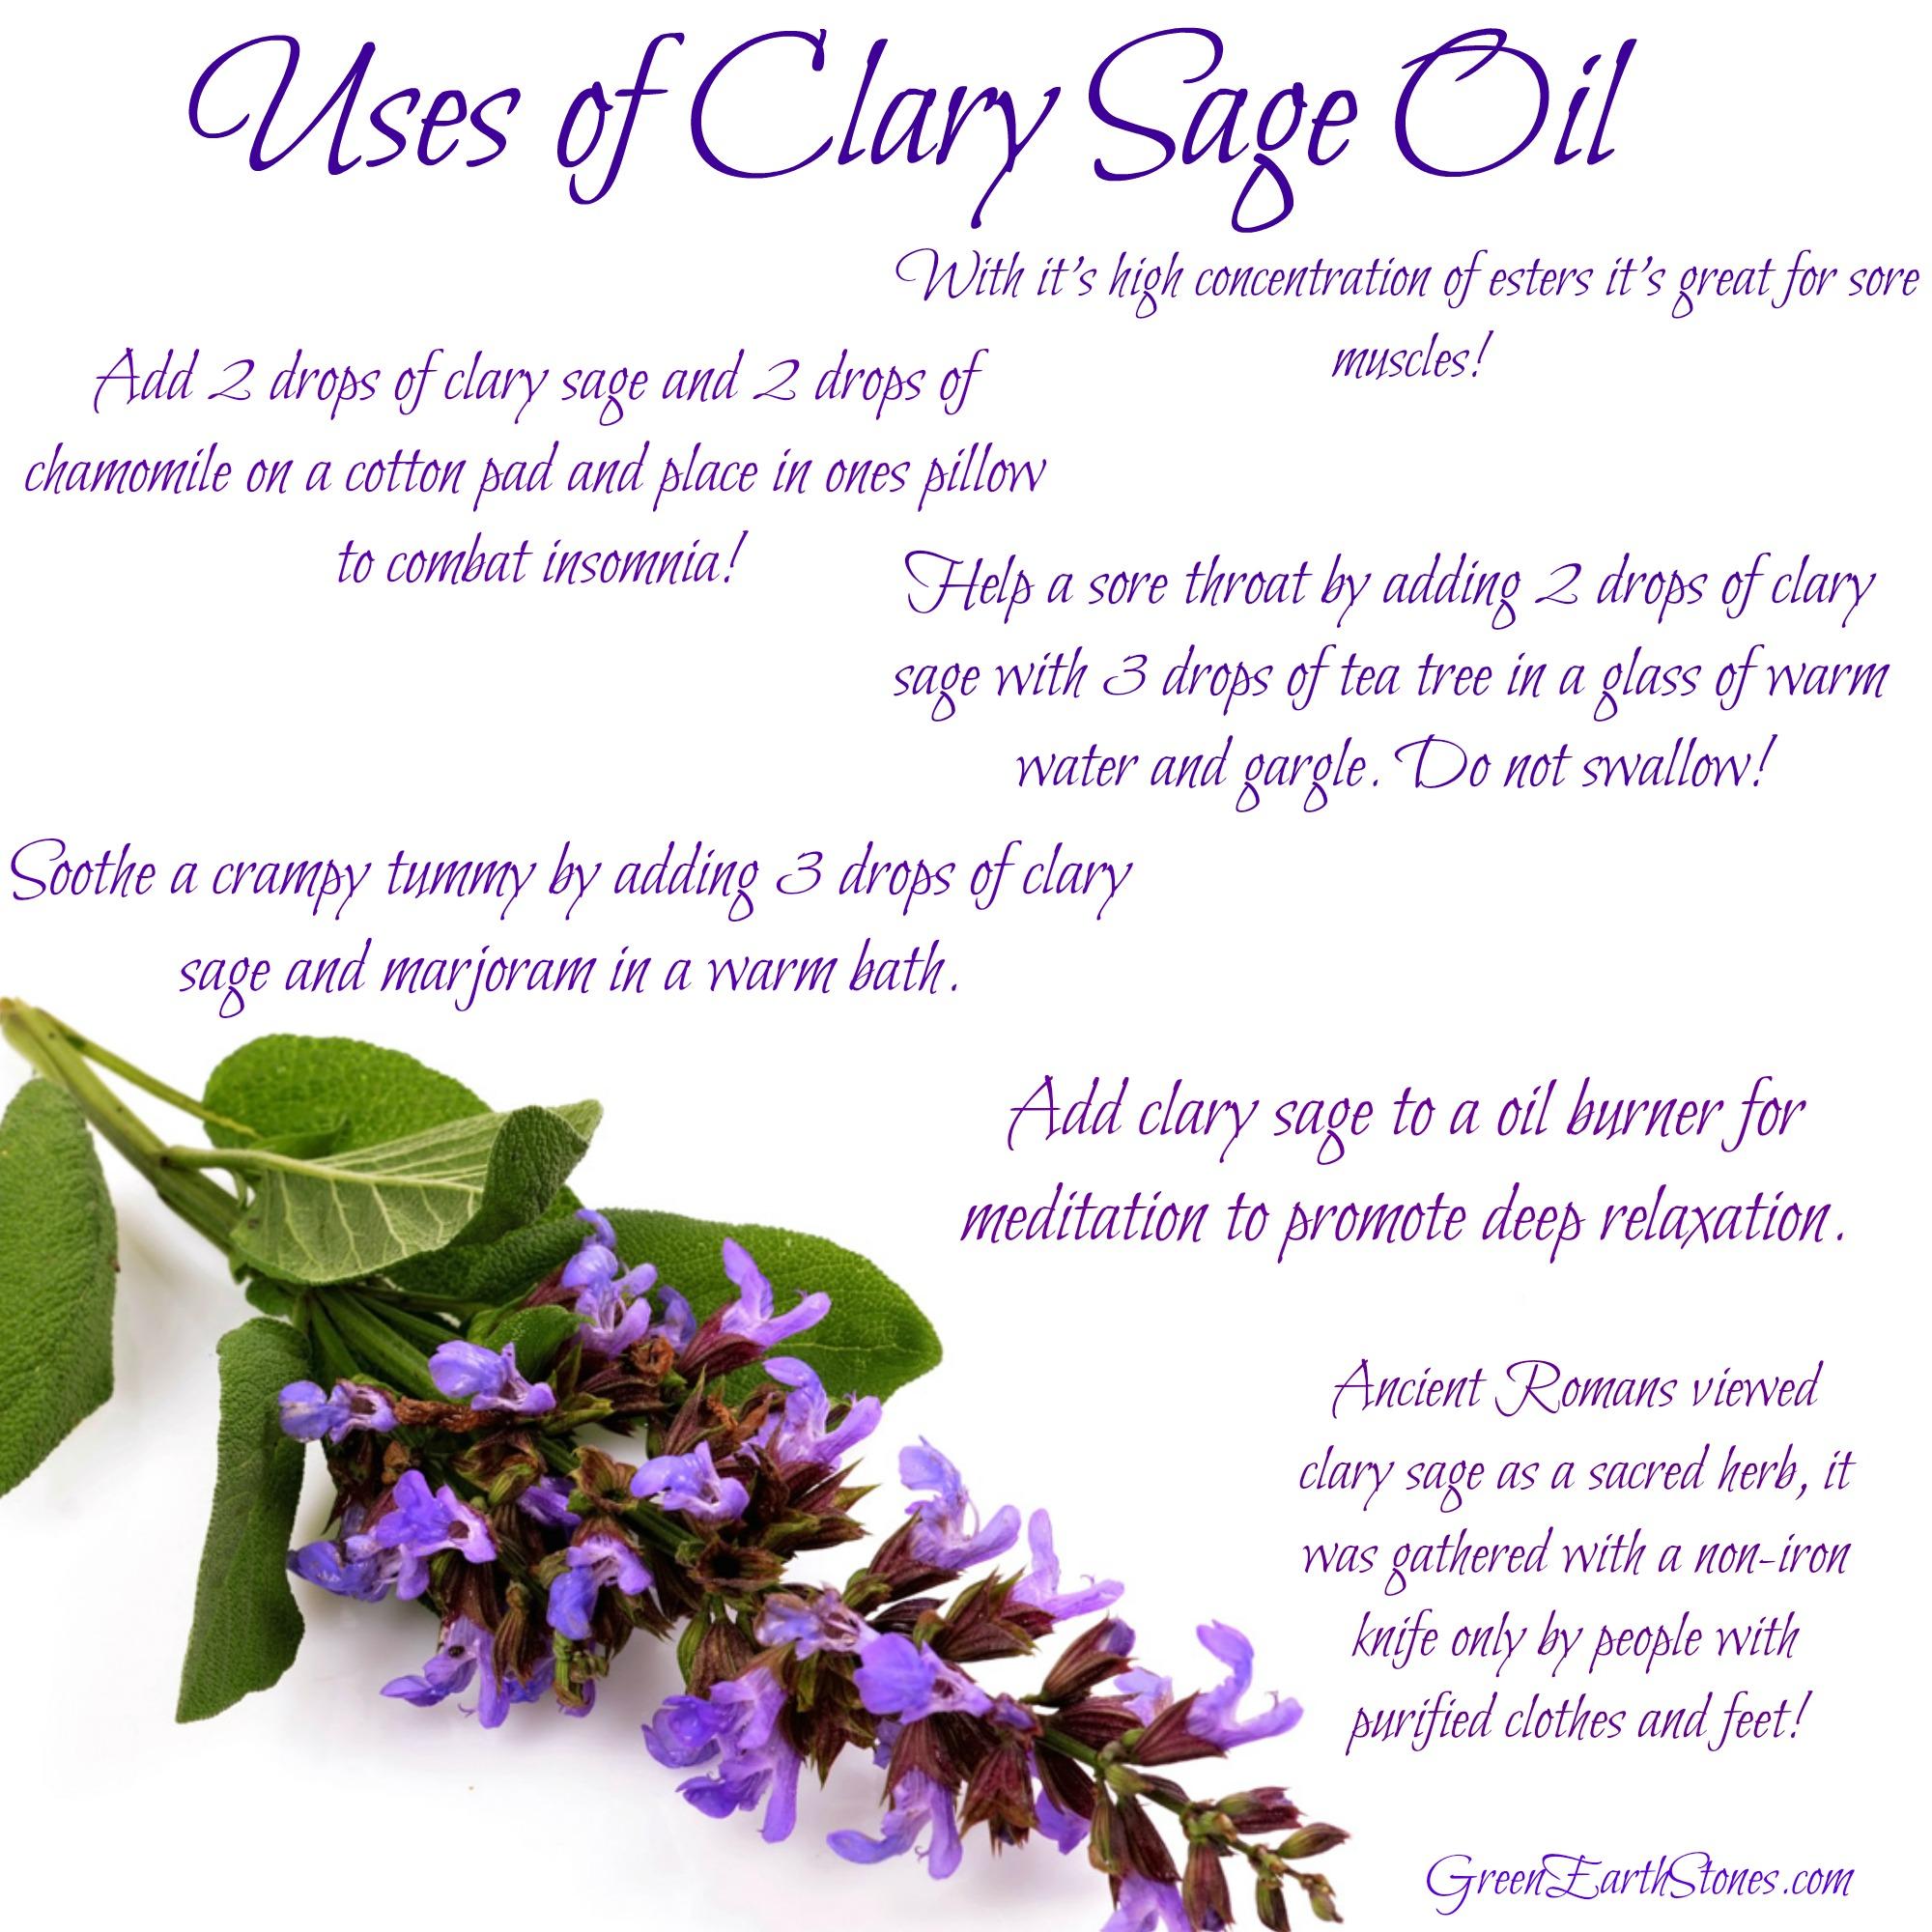 clary-sage-info-sheet.jpg